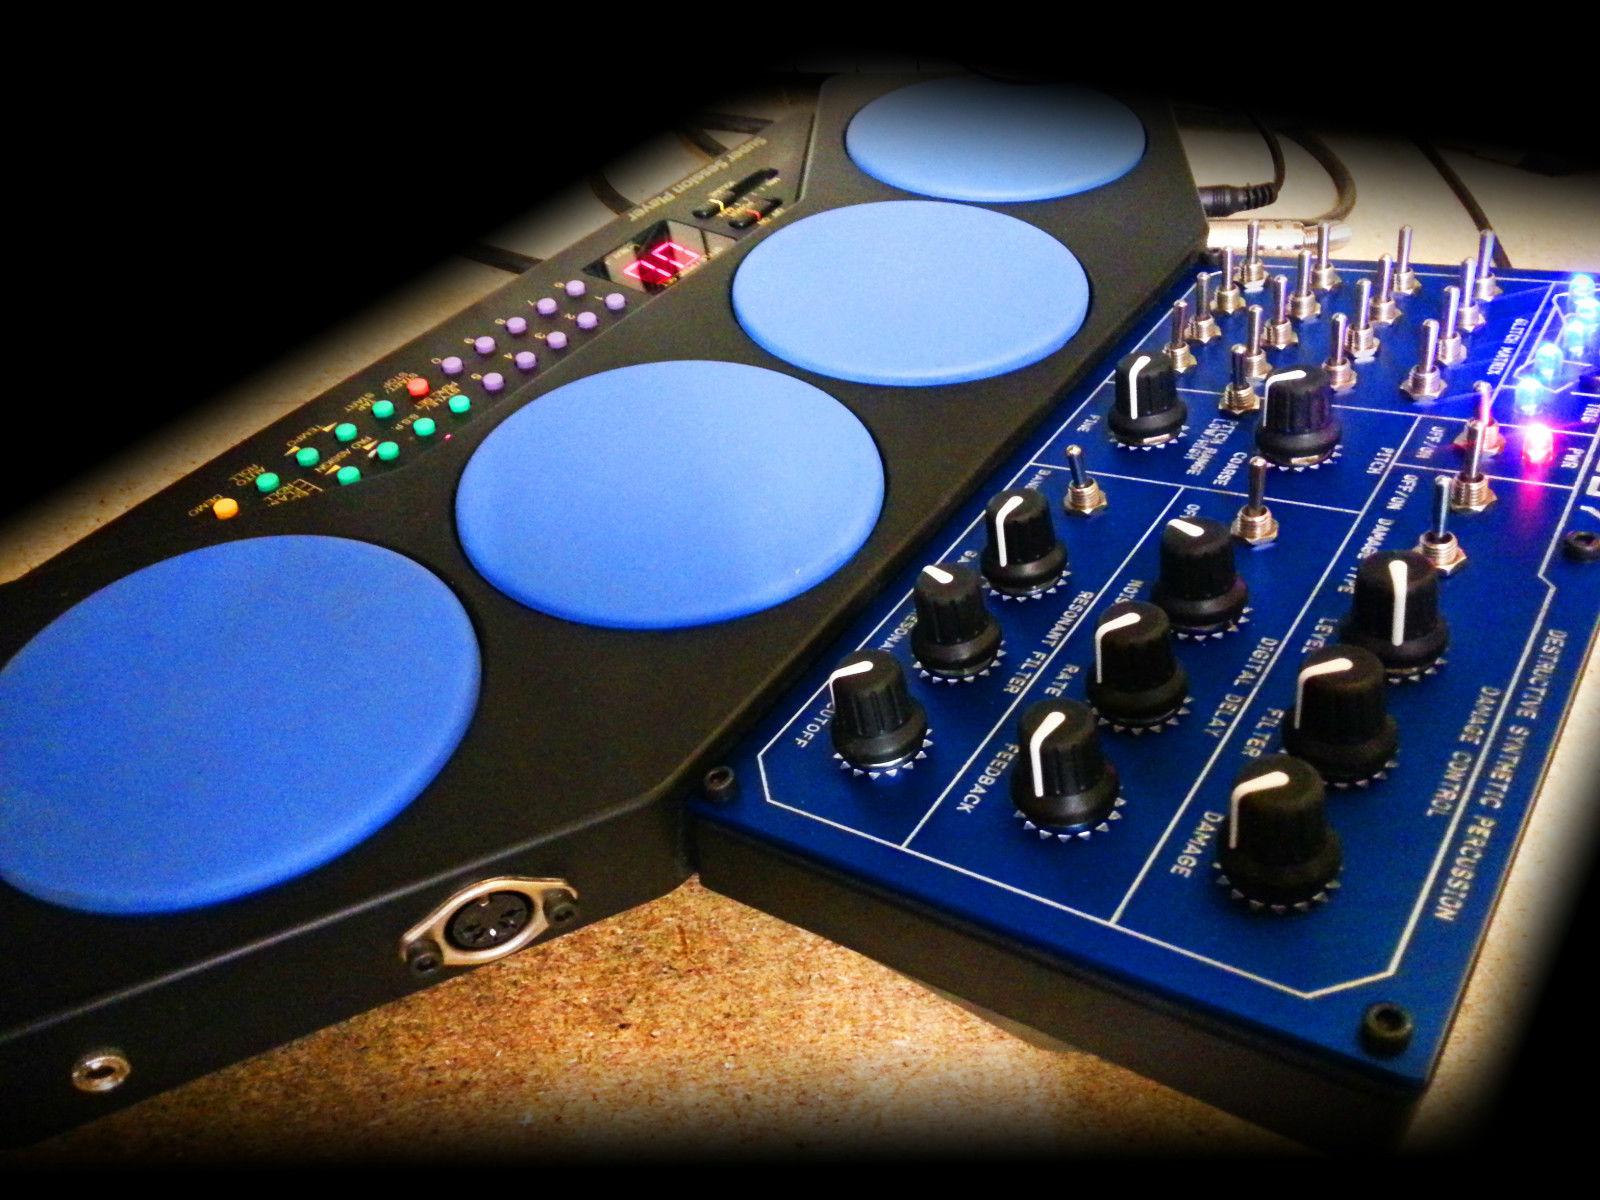 Circuit Bending Drum Worksheet And Wiring Diagram Bent Furby Matrixsynth X1l3 Synth Mod Yamaha Dd 7 Rh Com Toy Keyboard